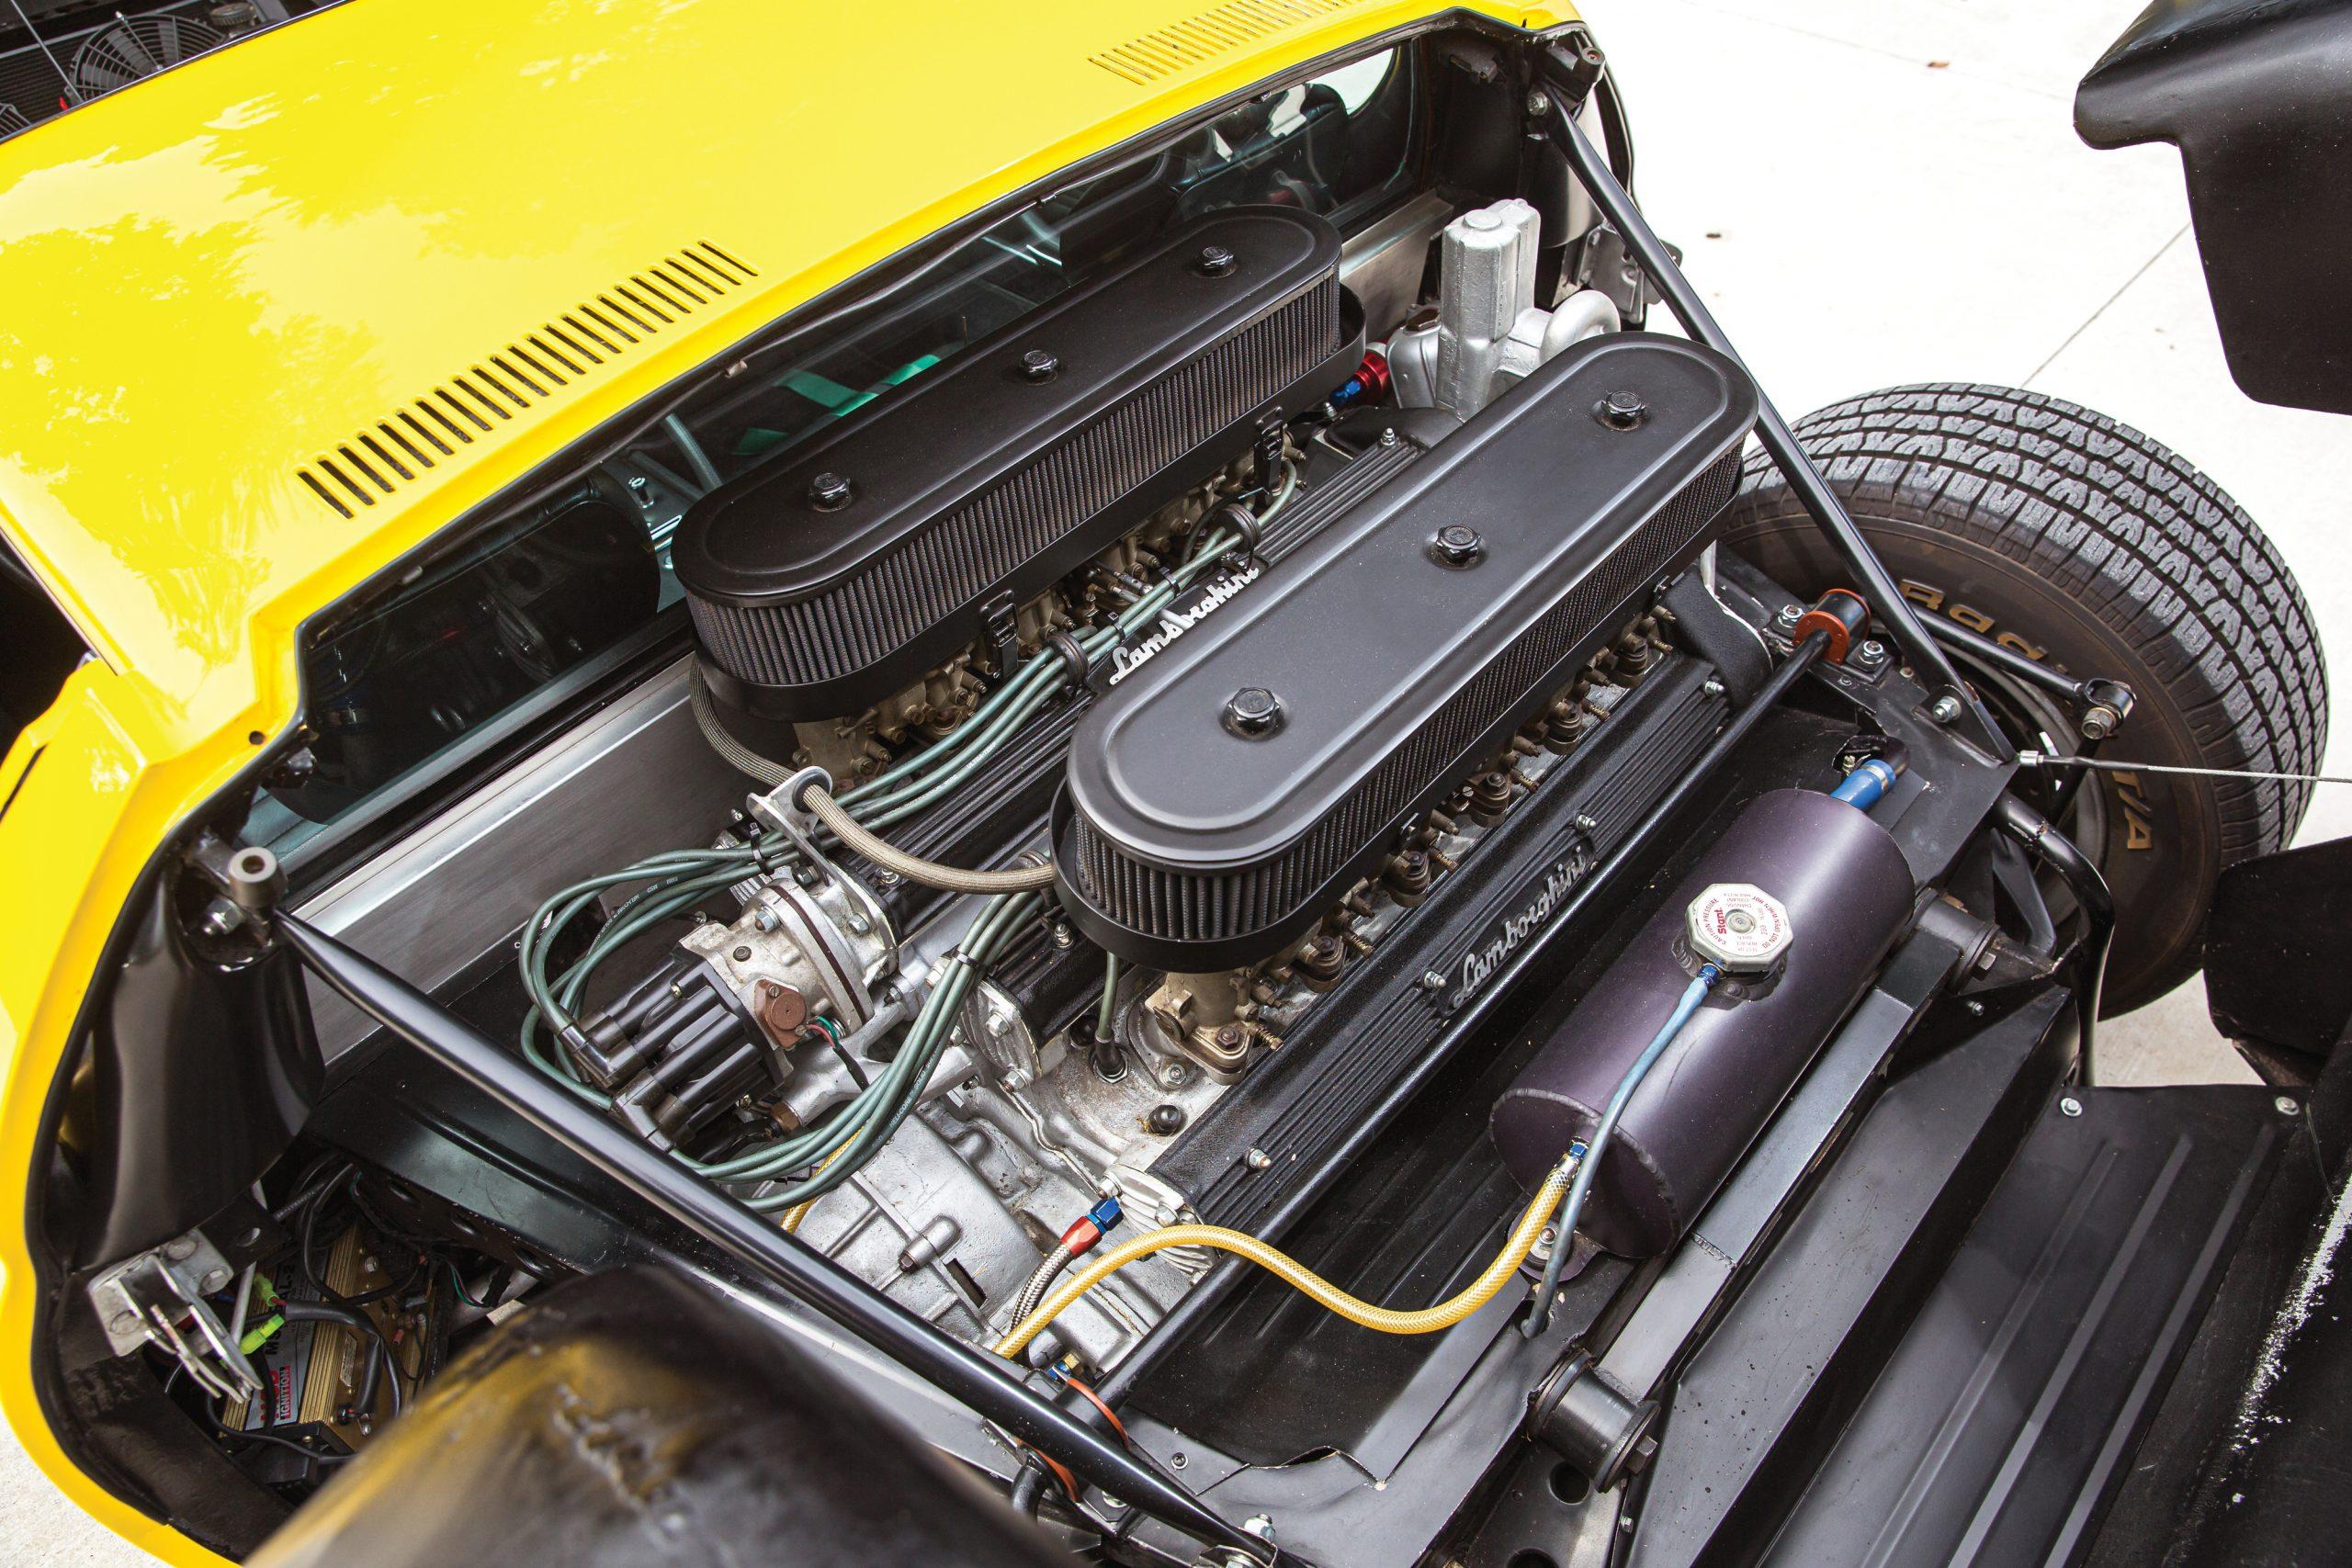 1969 Lamborghini Miura P400 S by Bertone engine